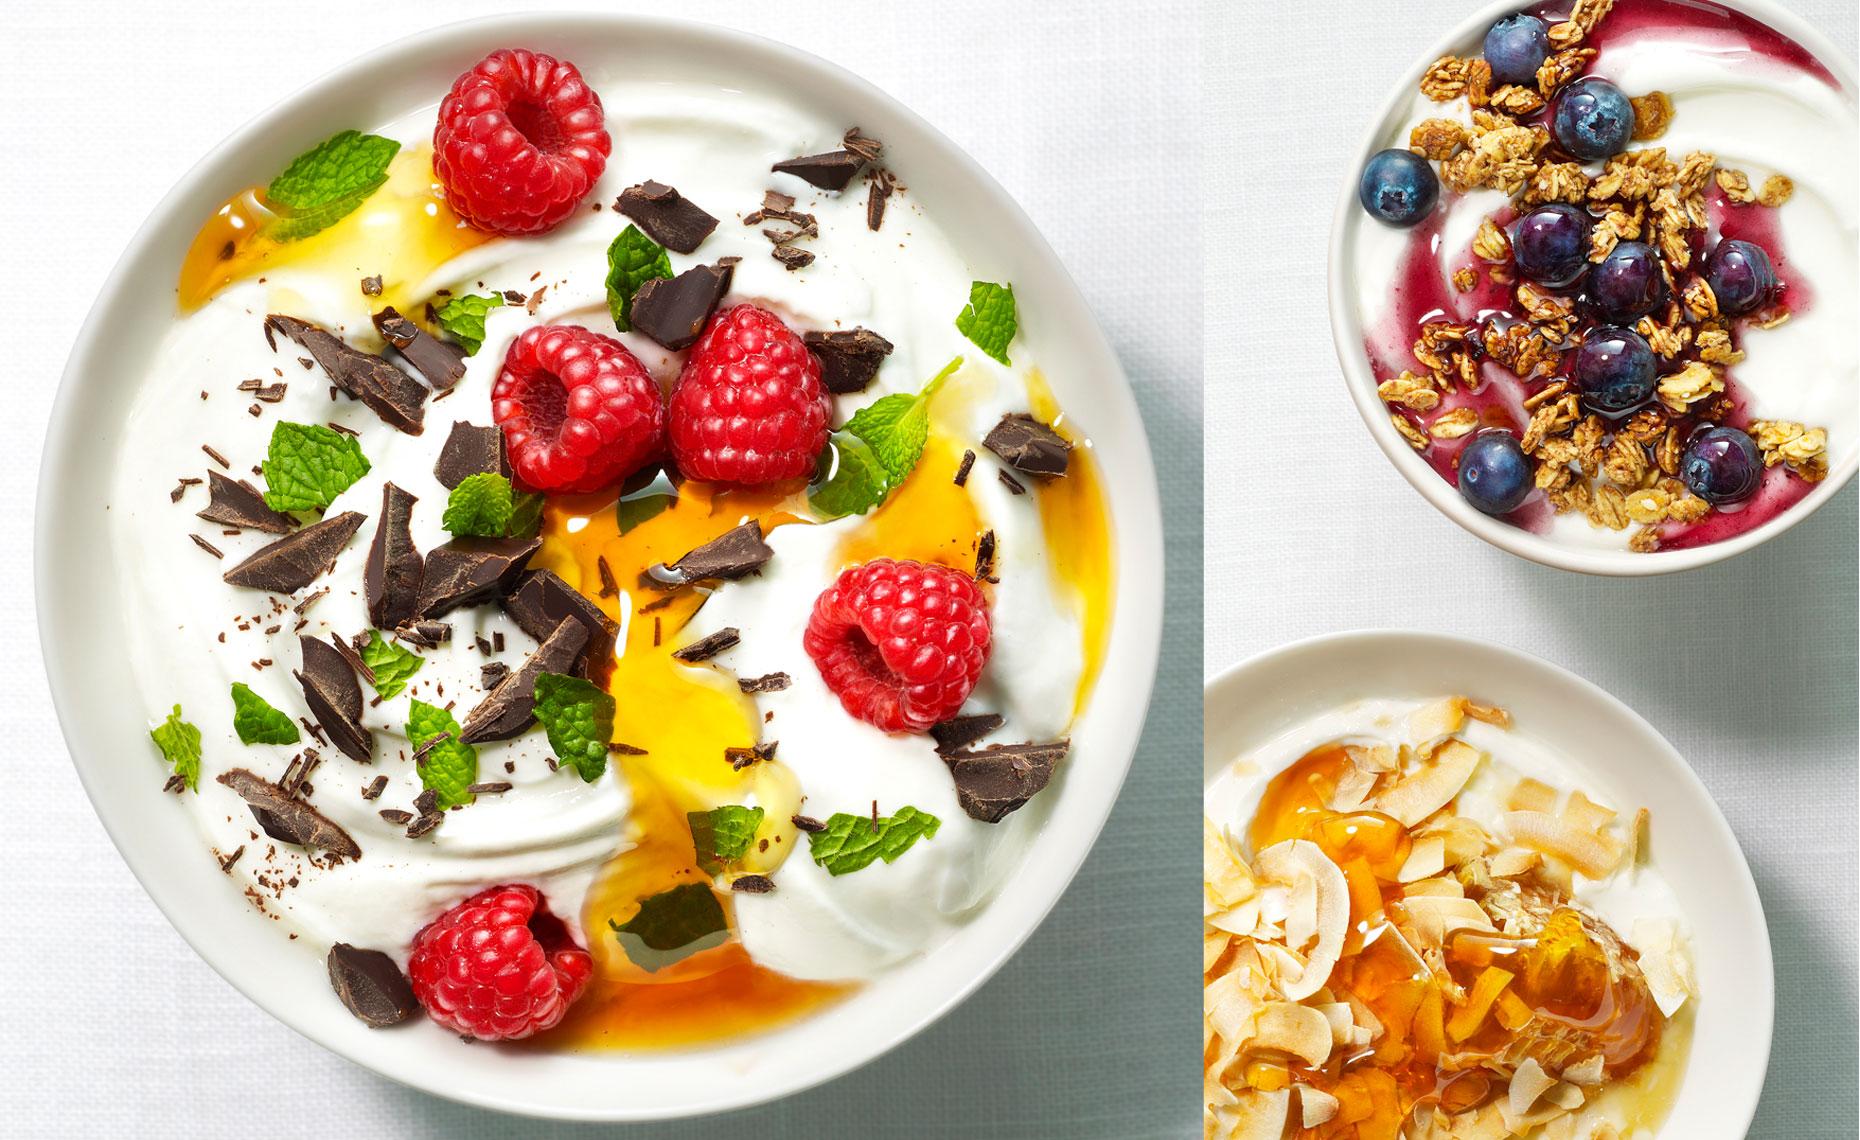 yogurt-bowls-resized.jpg